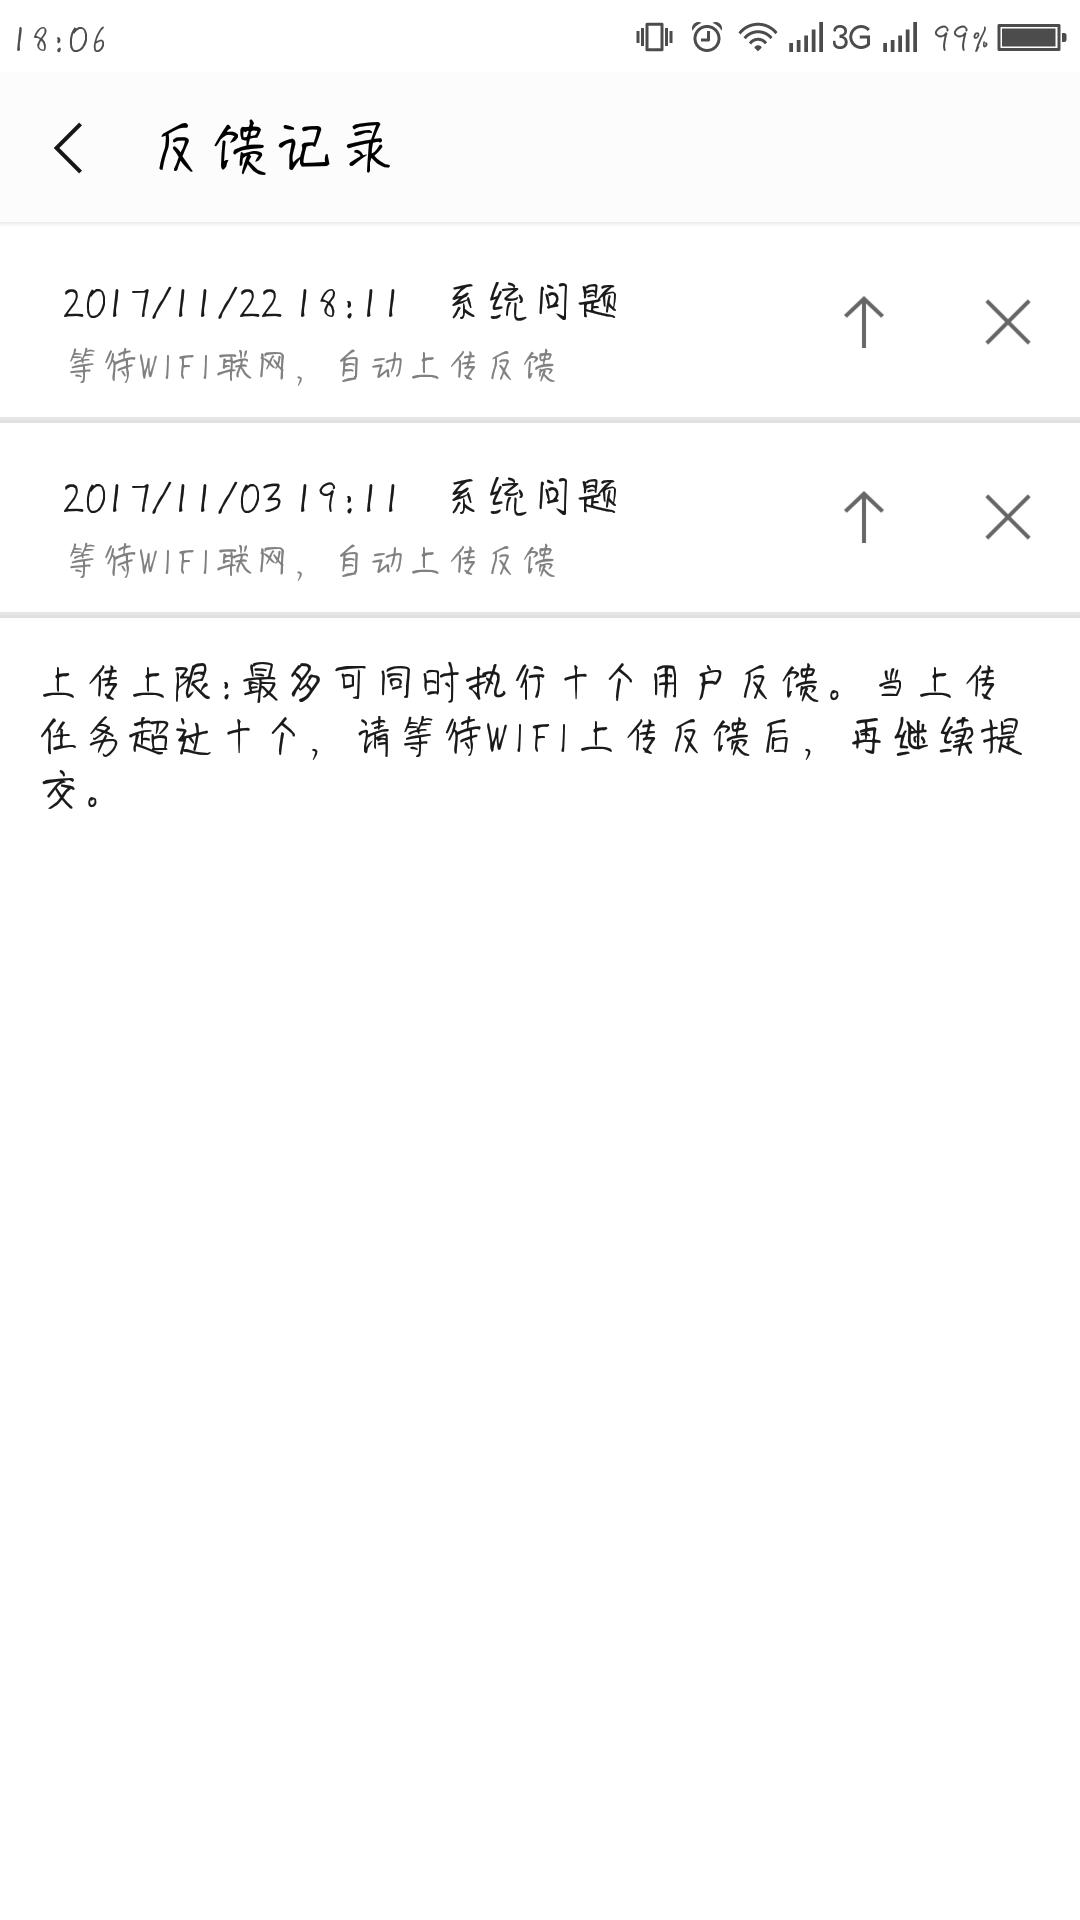 Screenshot_2017-11-22-18-06-22.png